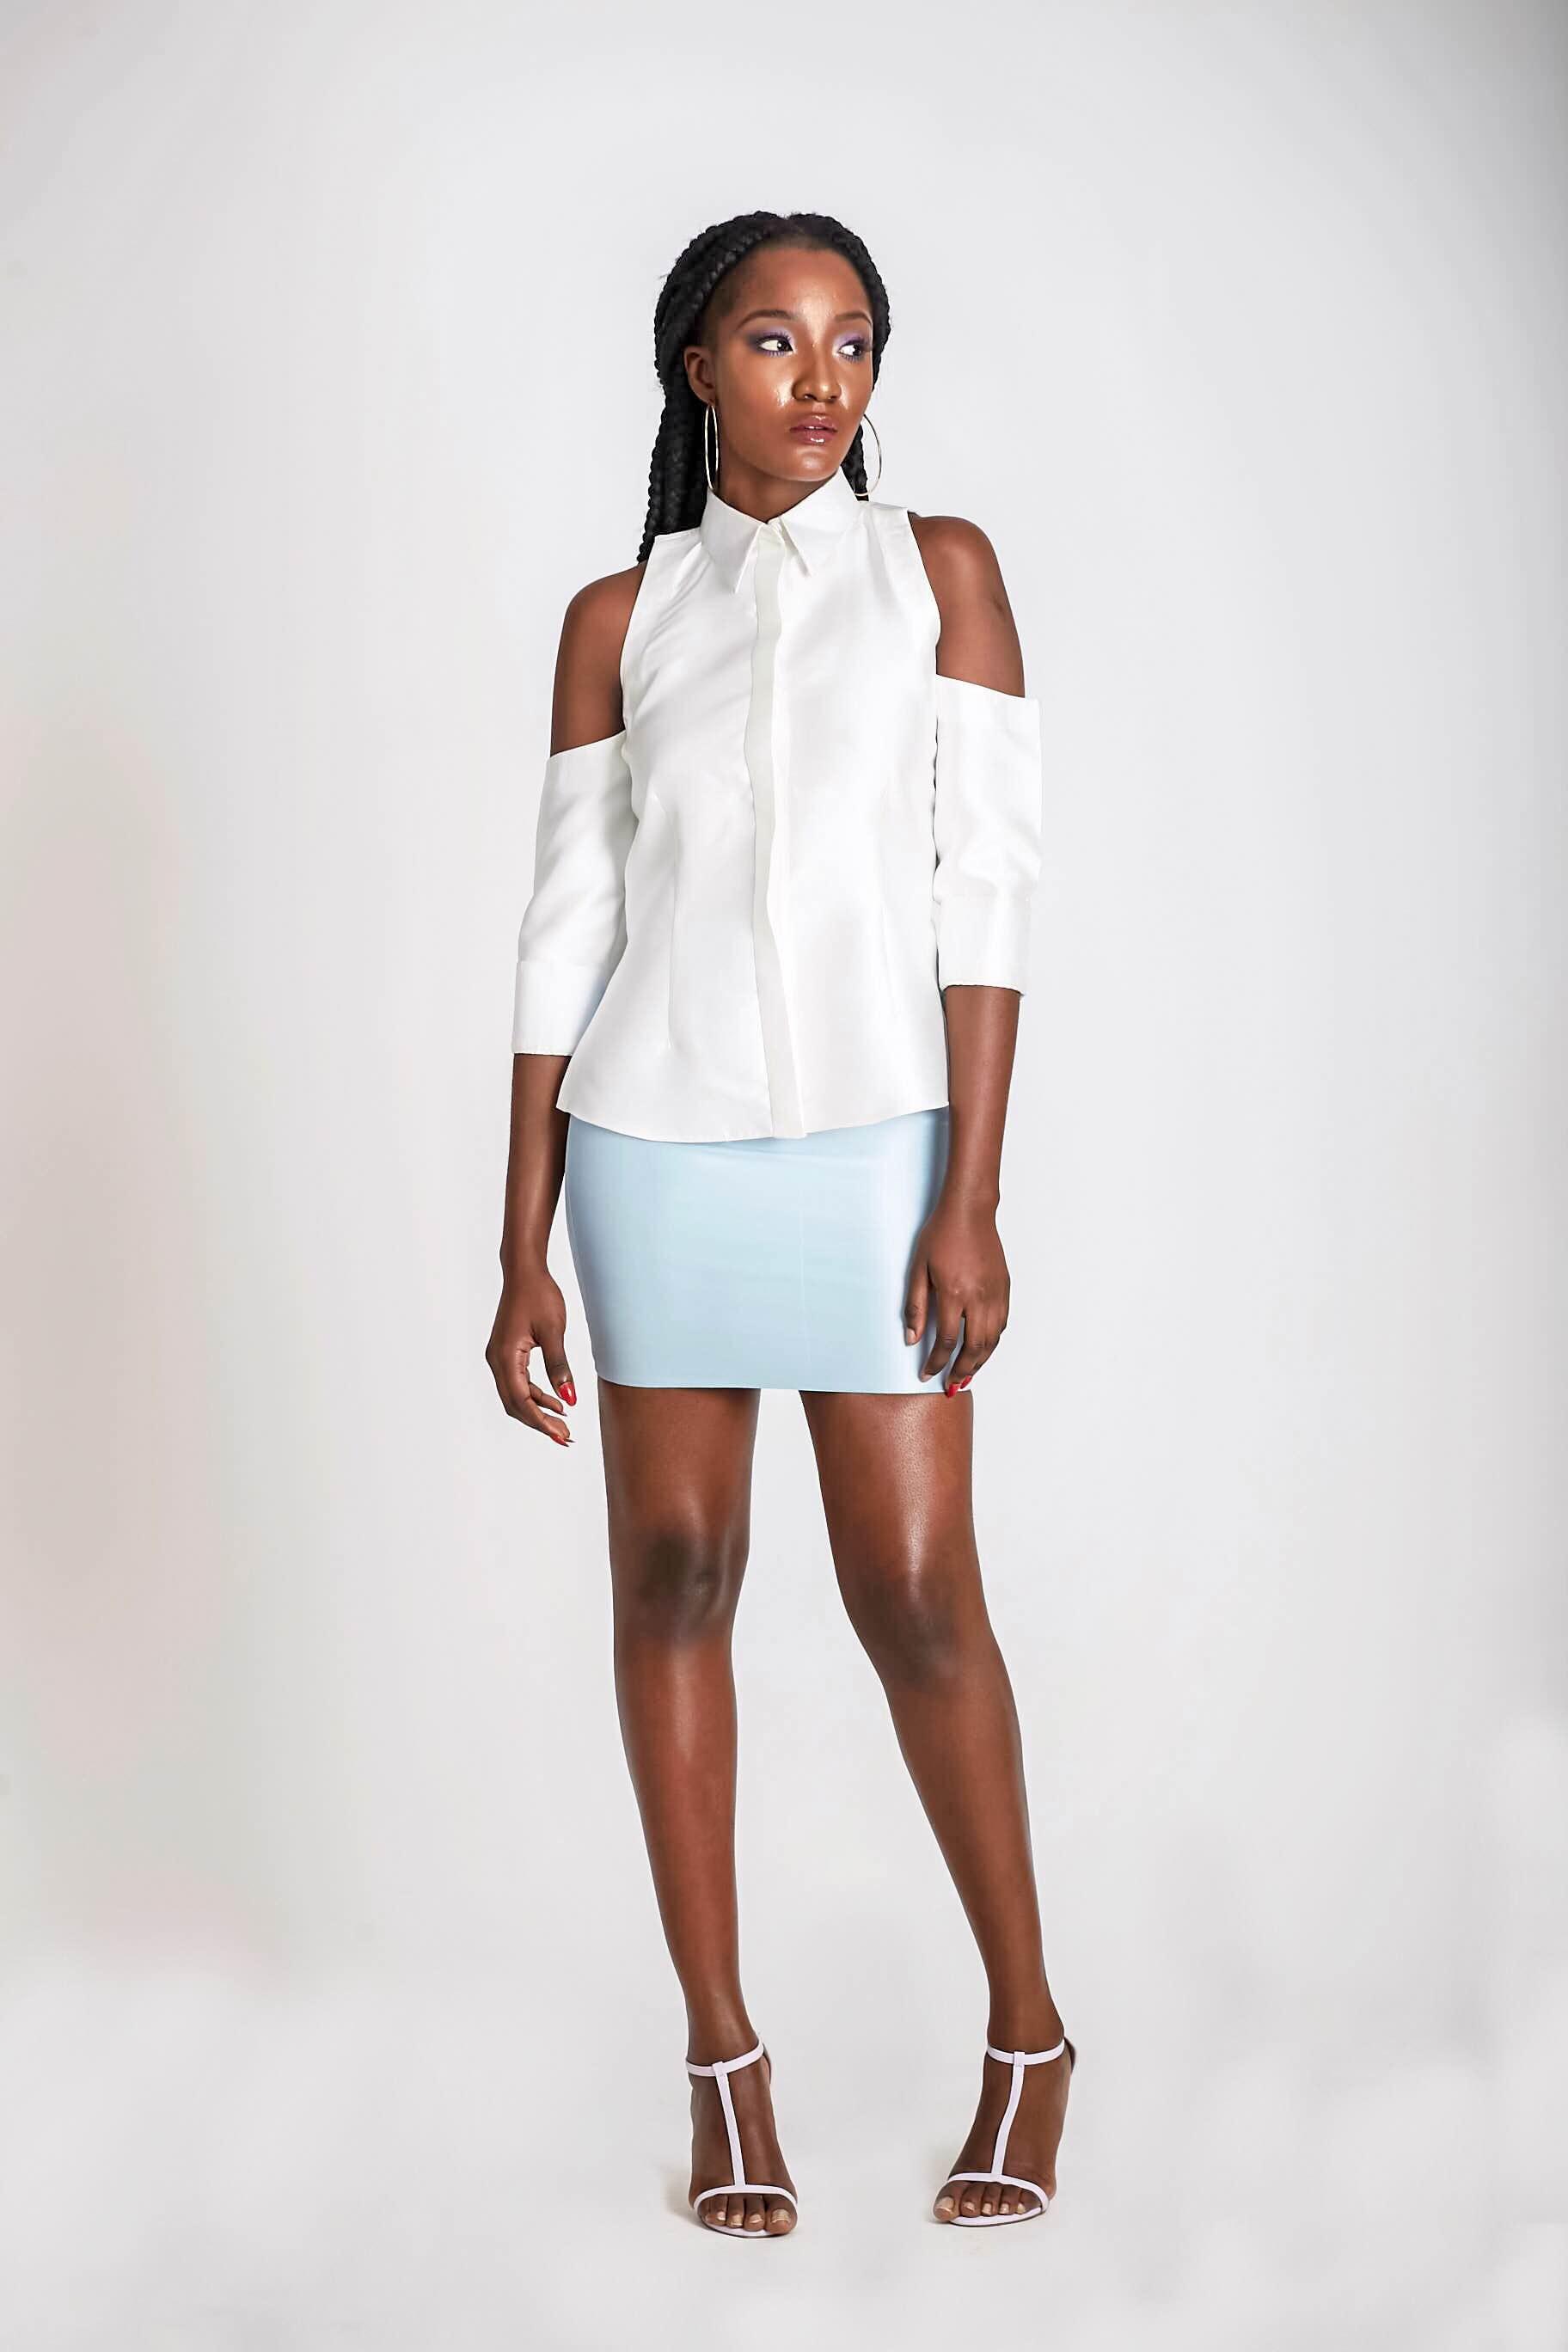 Imad Eduso - BN Style - Collection Lookbook - BellaNaija.com 025